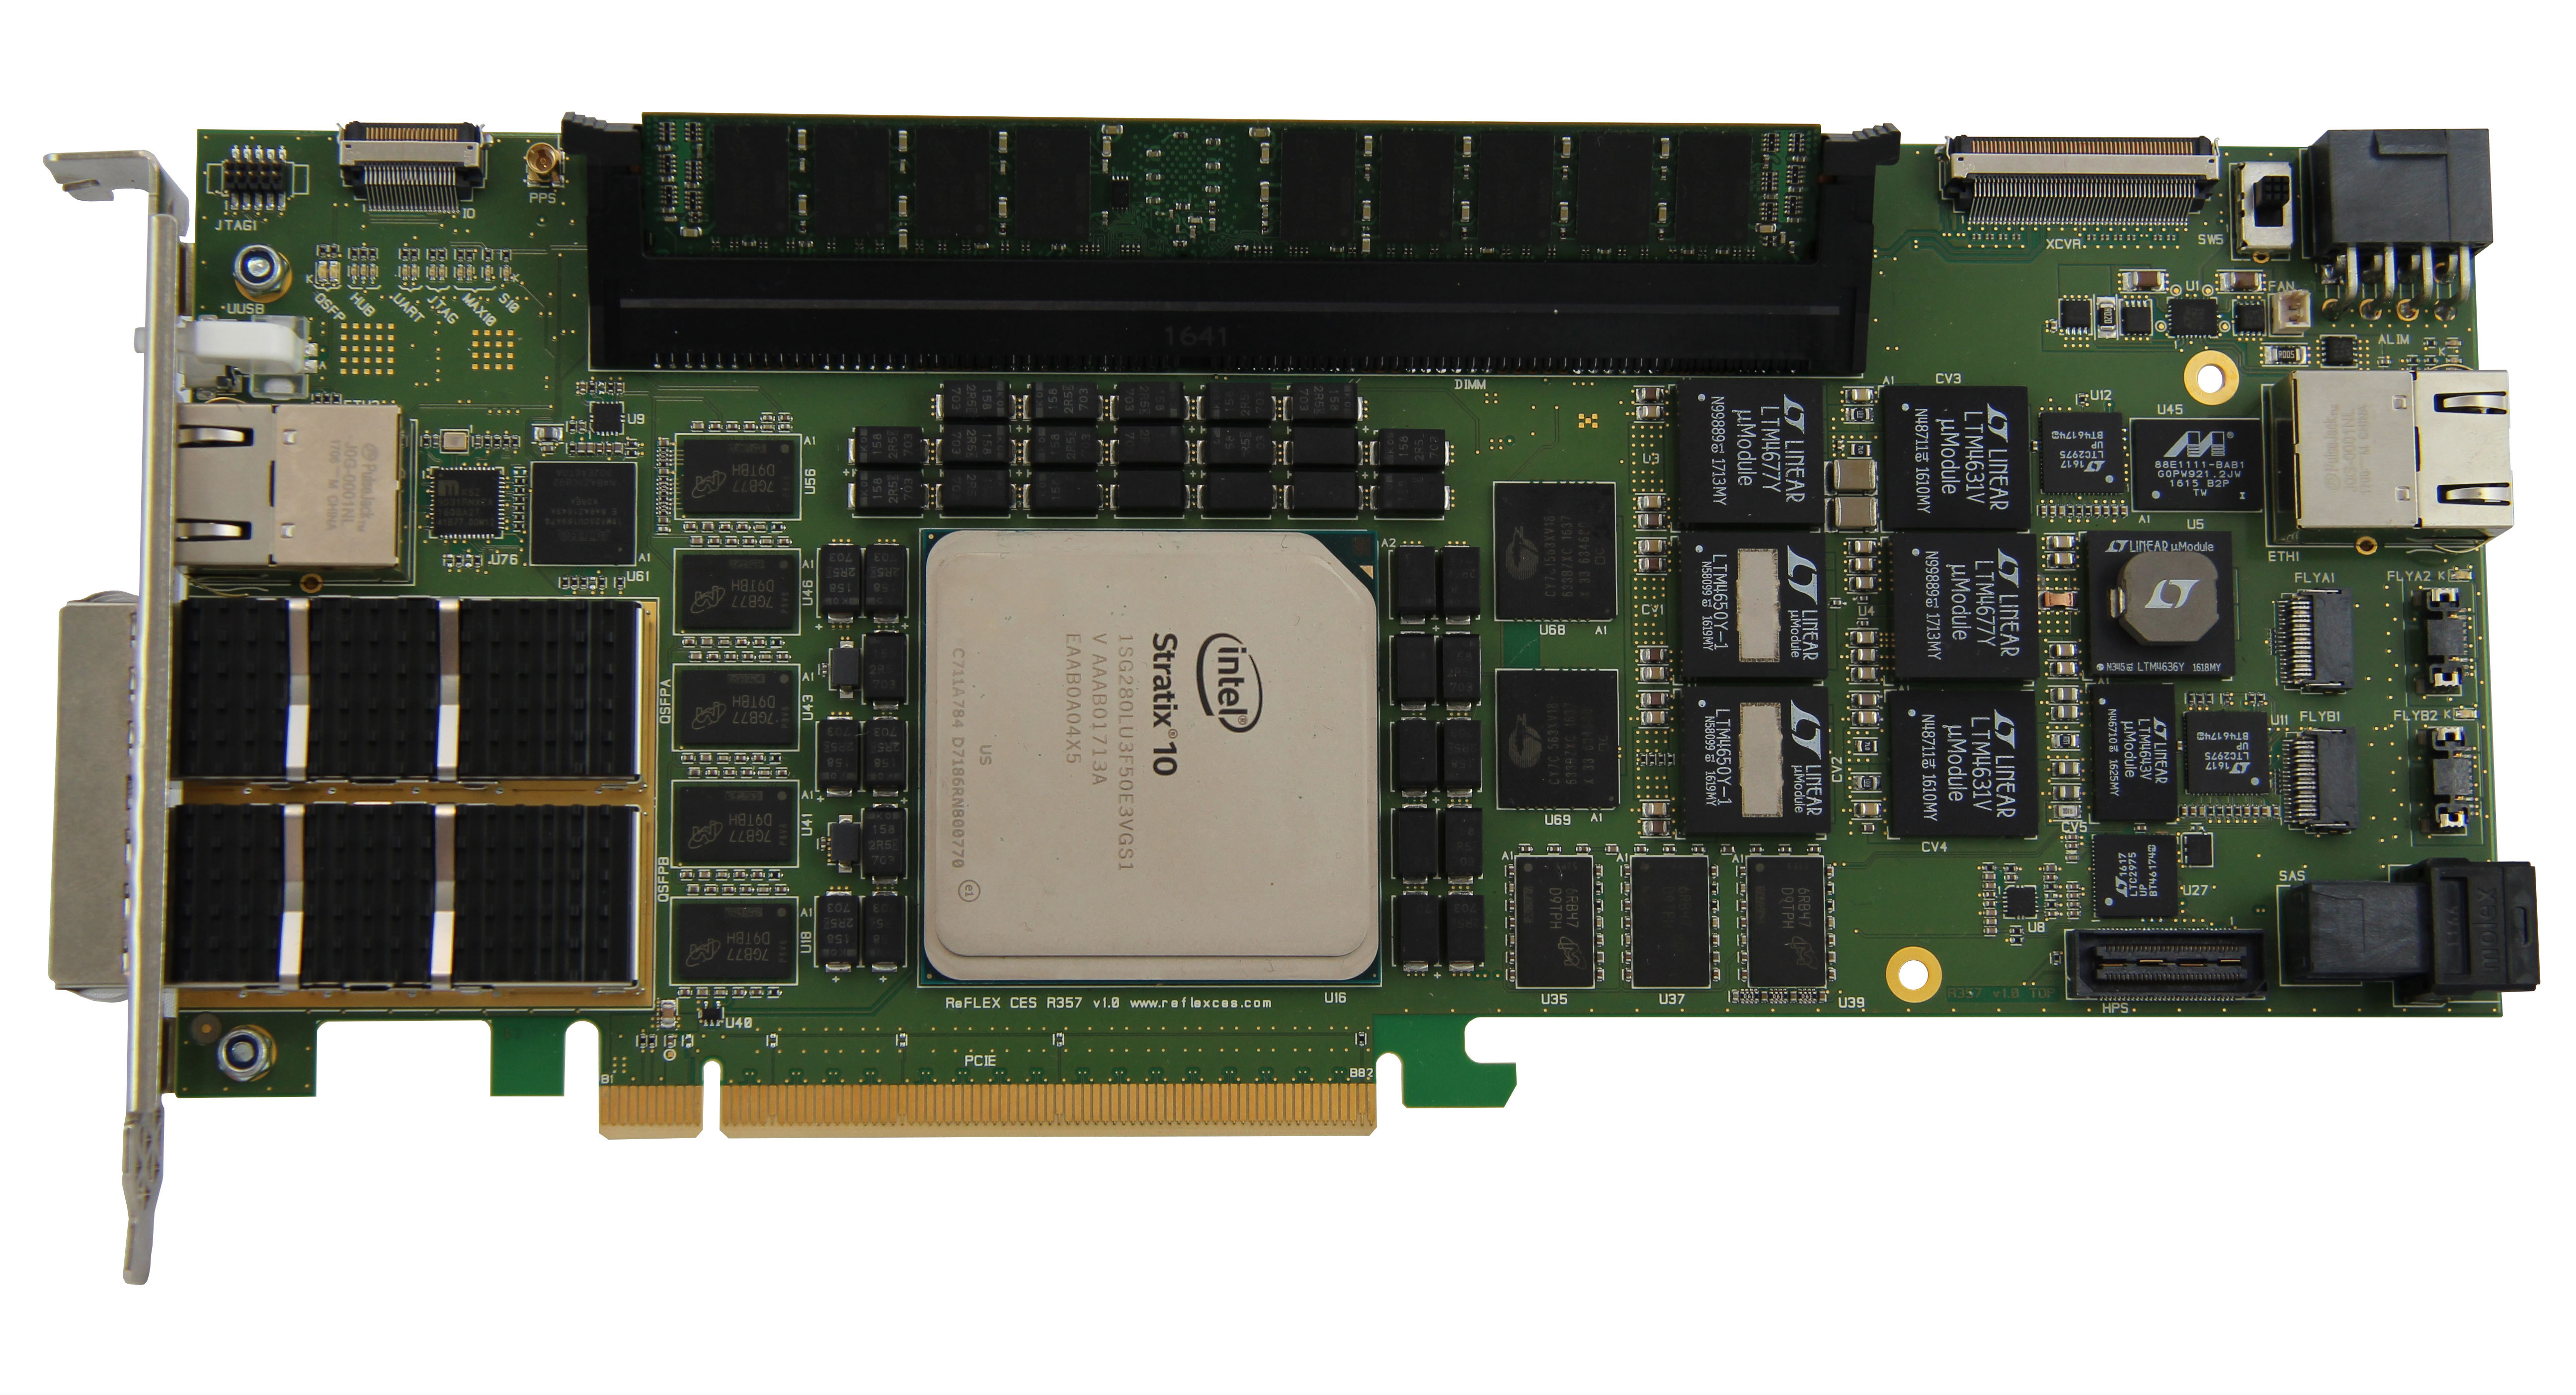 Stratix 10 FPGA: REFLEX CES Adds 26G Acceleration Hardware to the